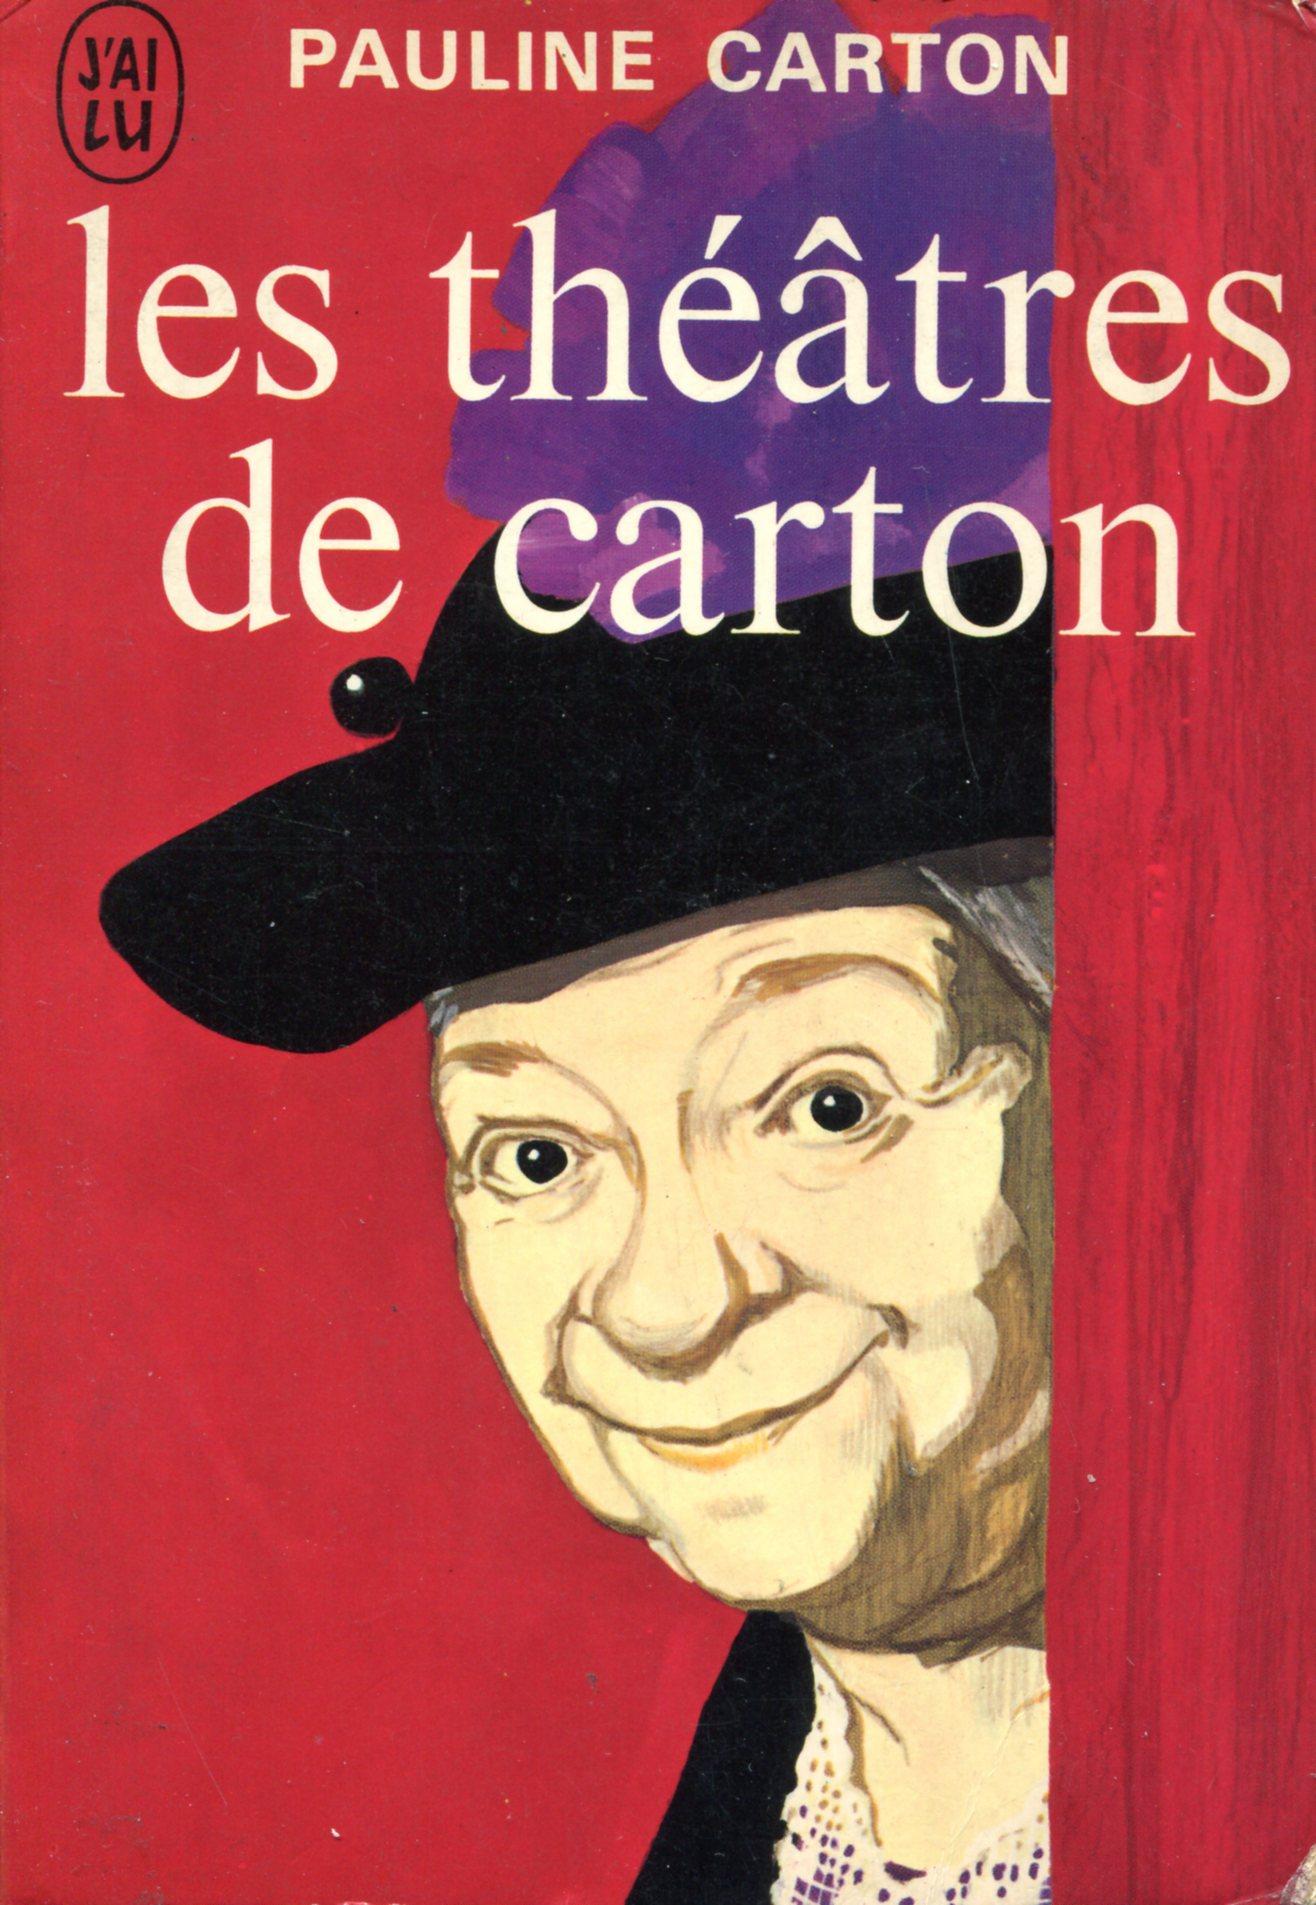 Carton Les théâtres 01.jpg